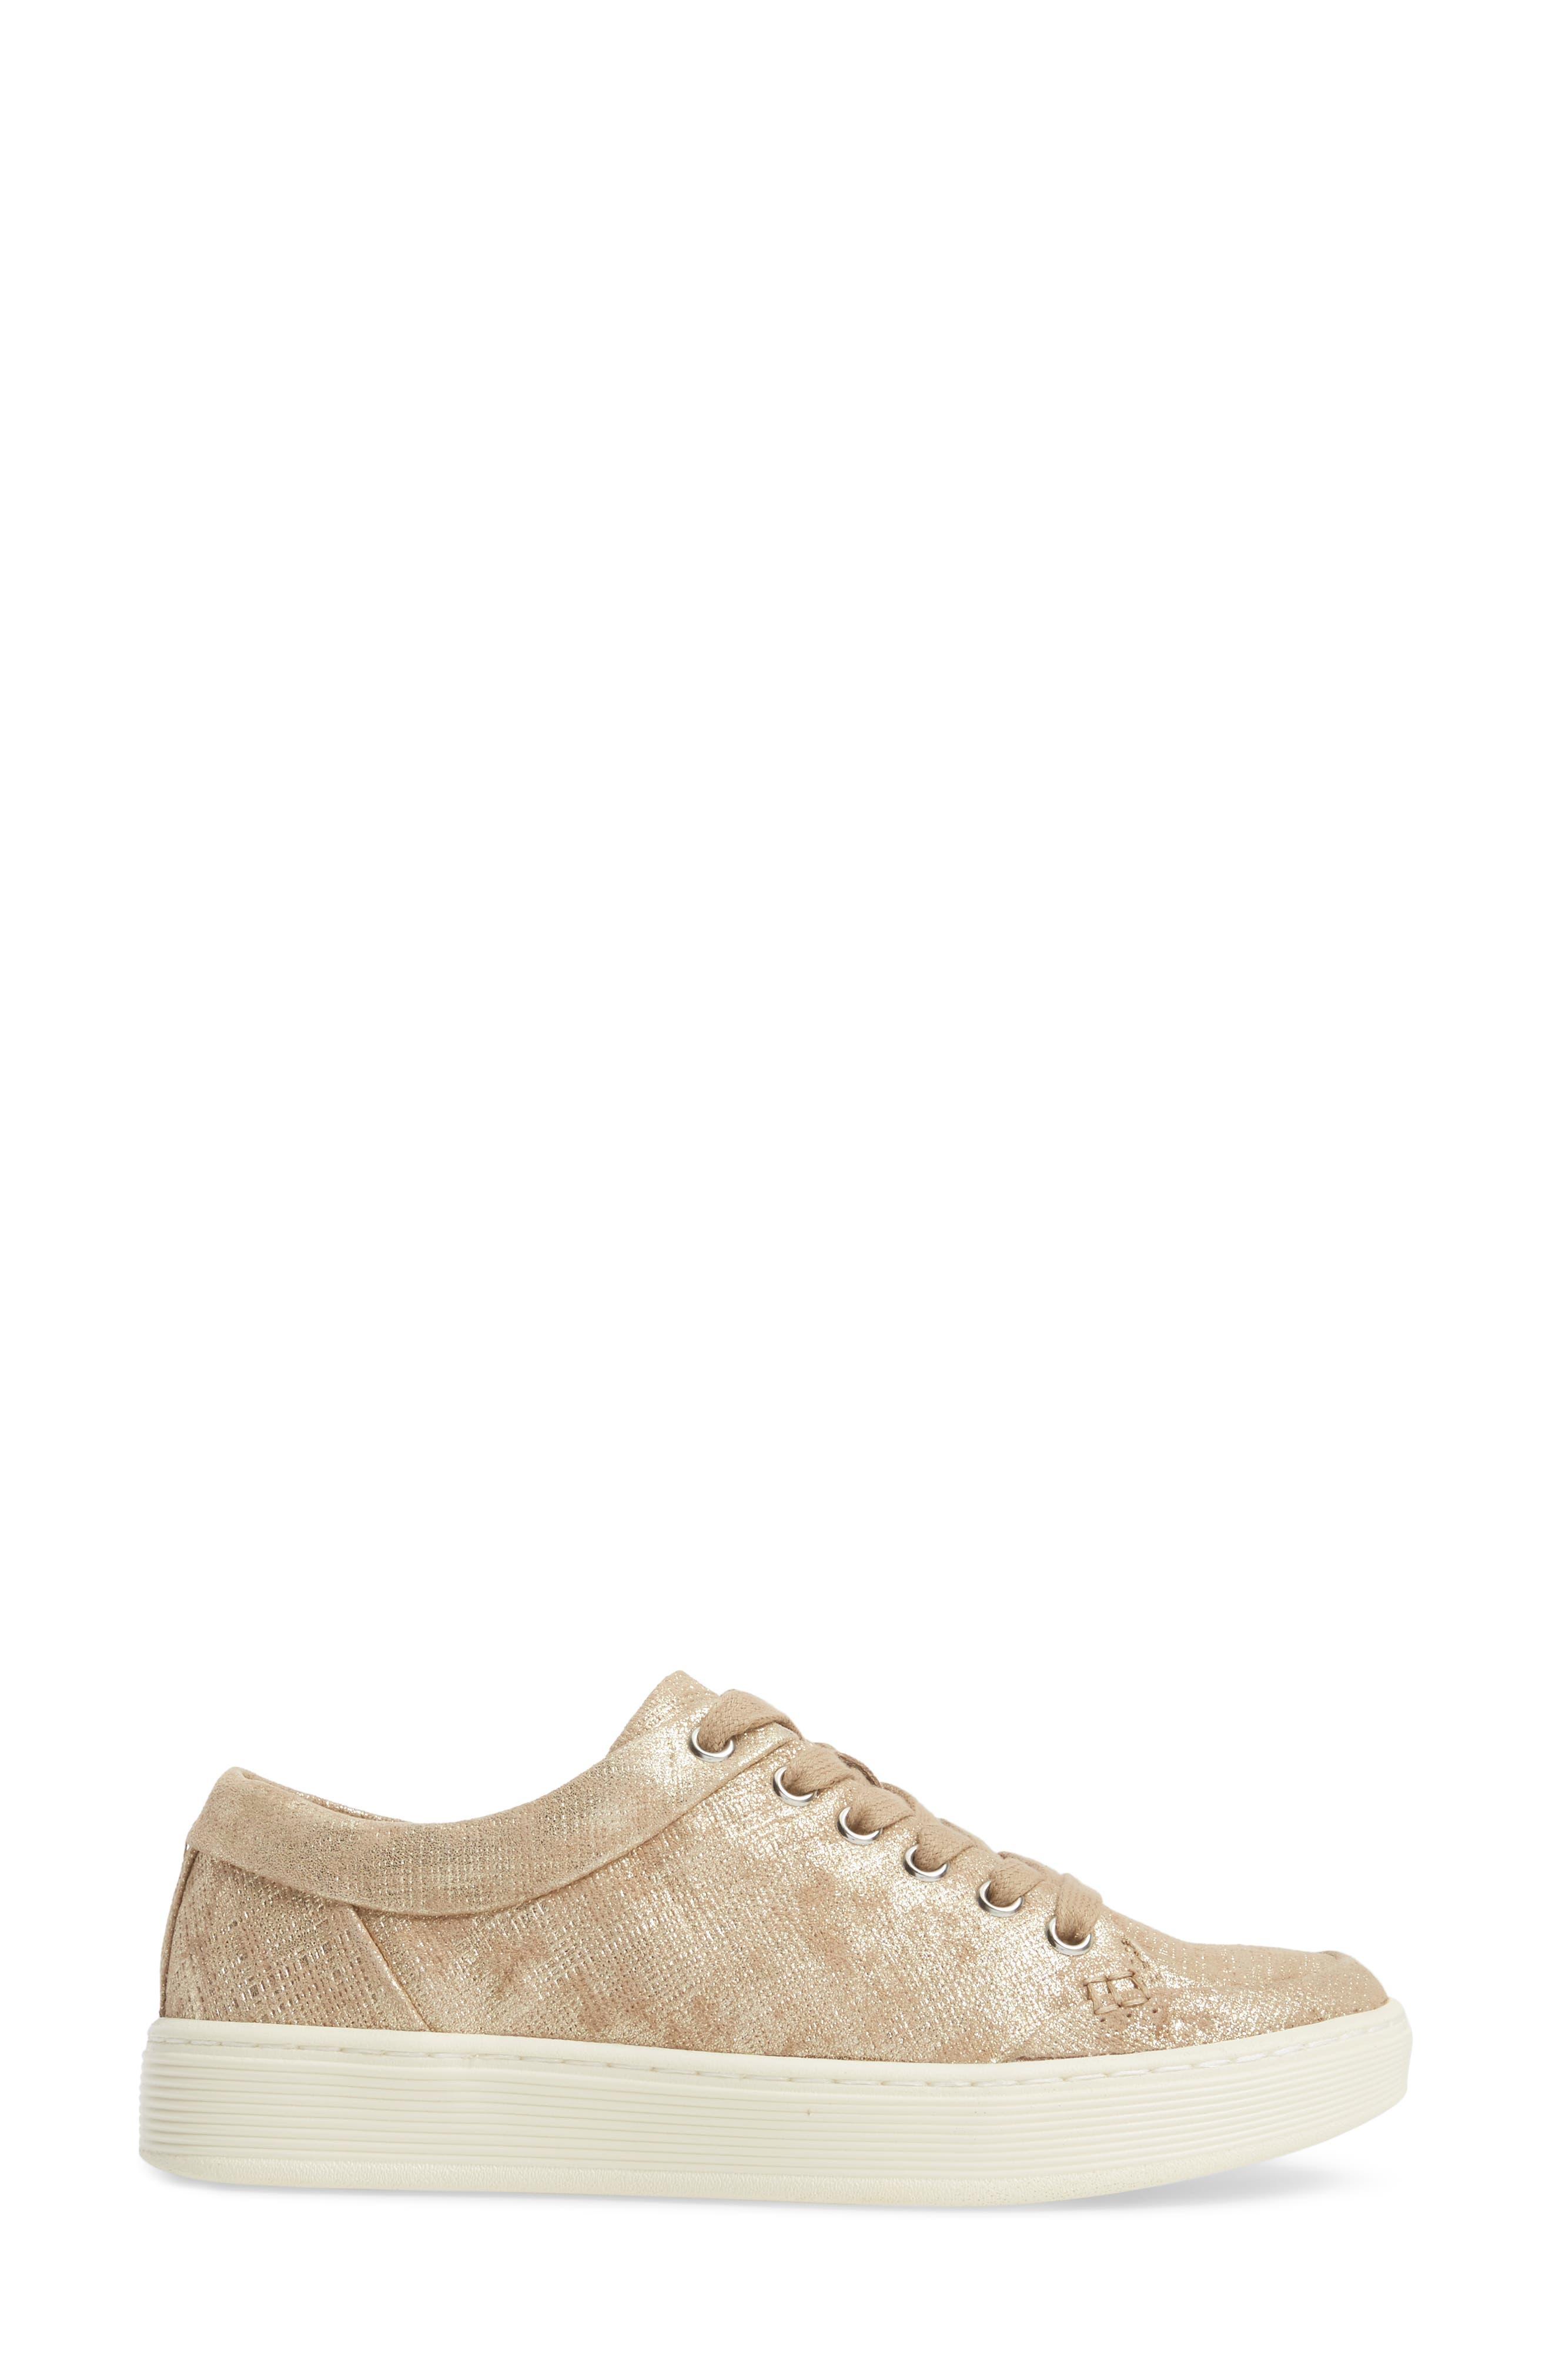 Sanders Sneaker,                             Alternate thumbnail 3, color,                             Platino Distressed Suede